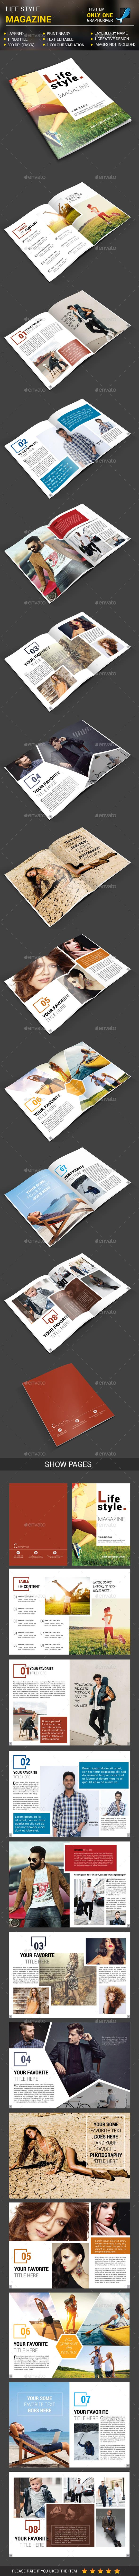 Lifestyle Magazine - Magazines Print Templates